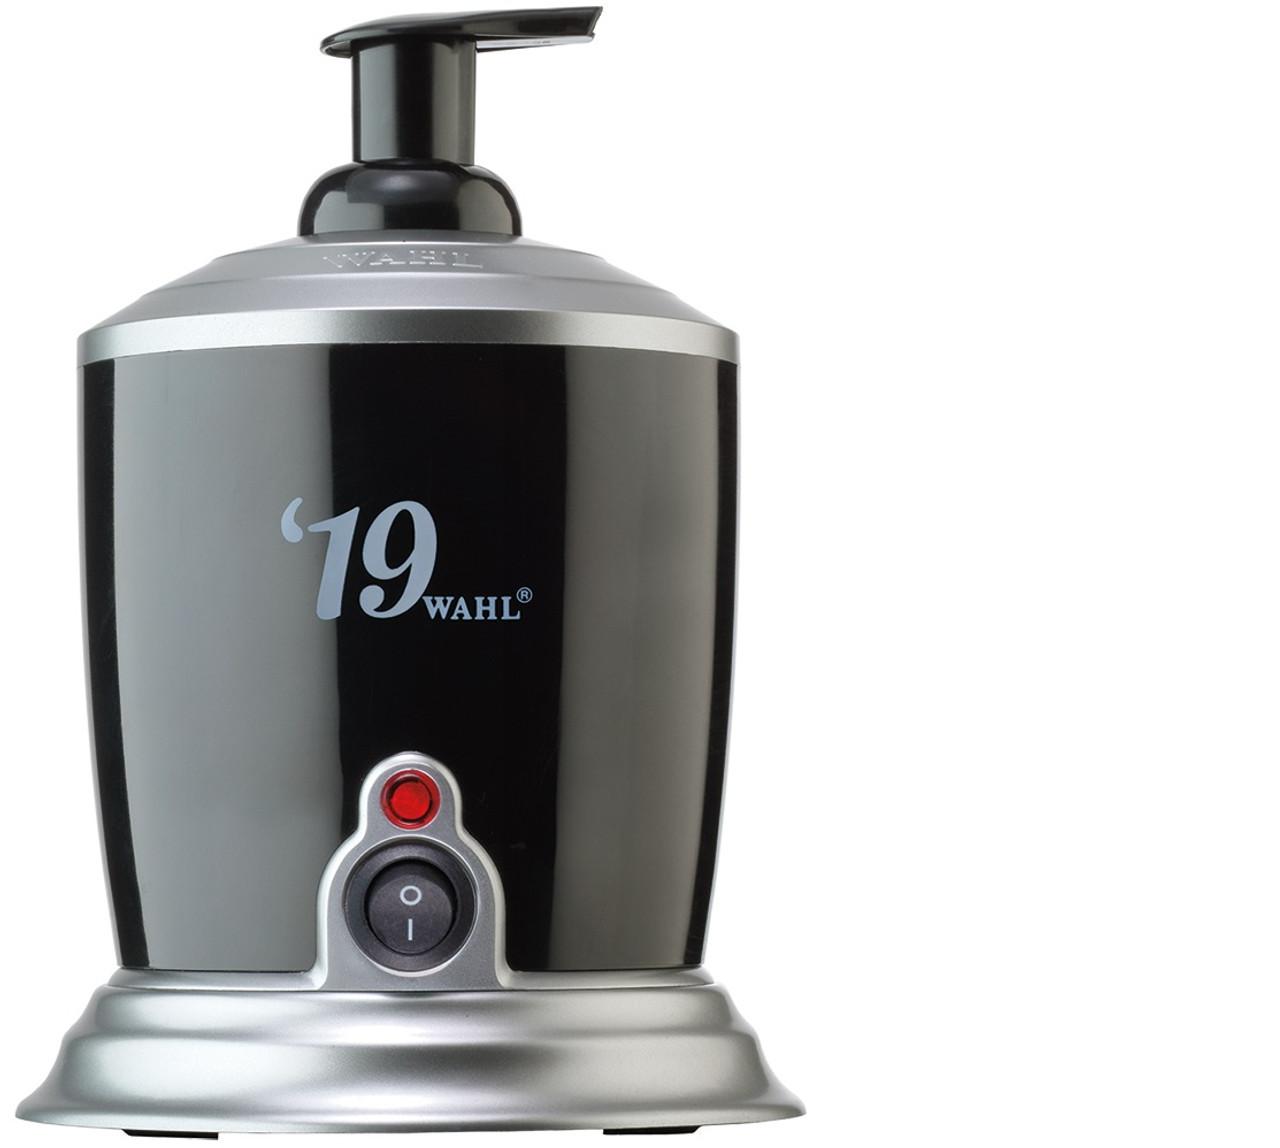 Wahl Hot Lather Machine